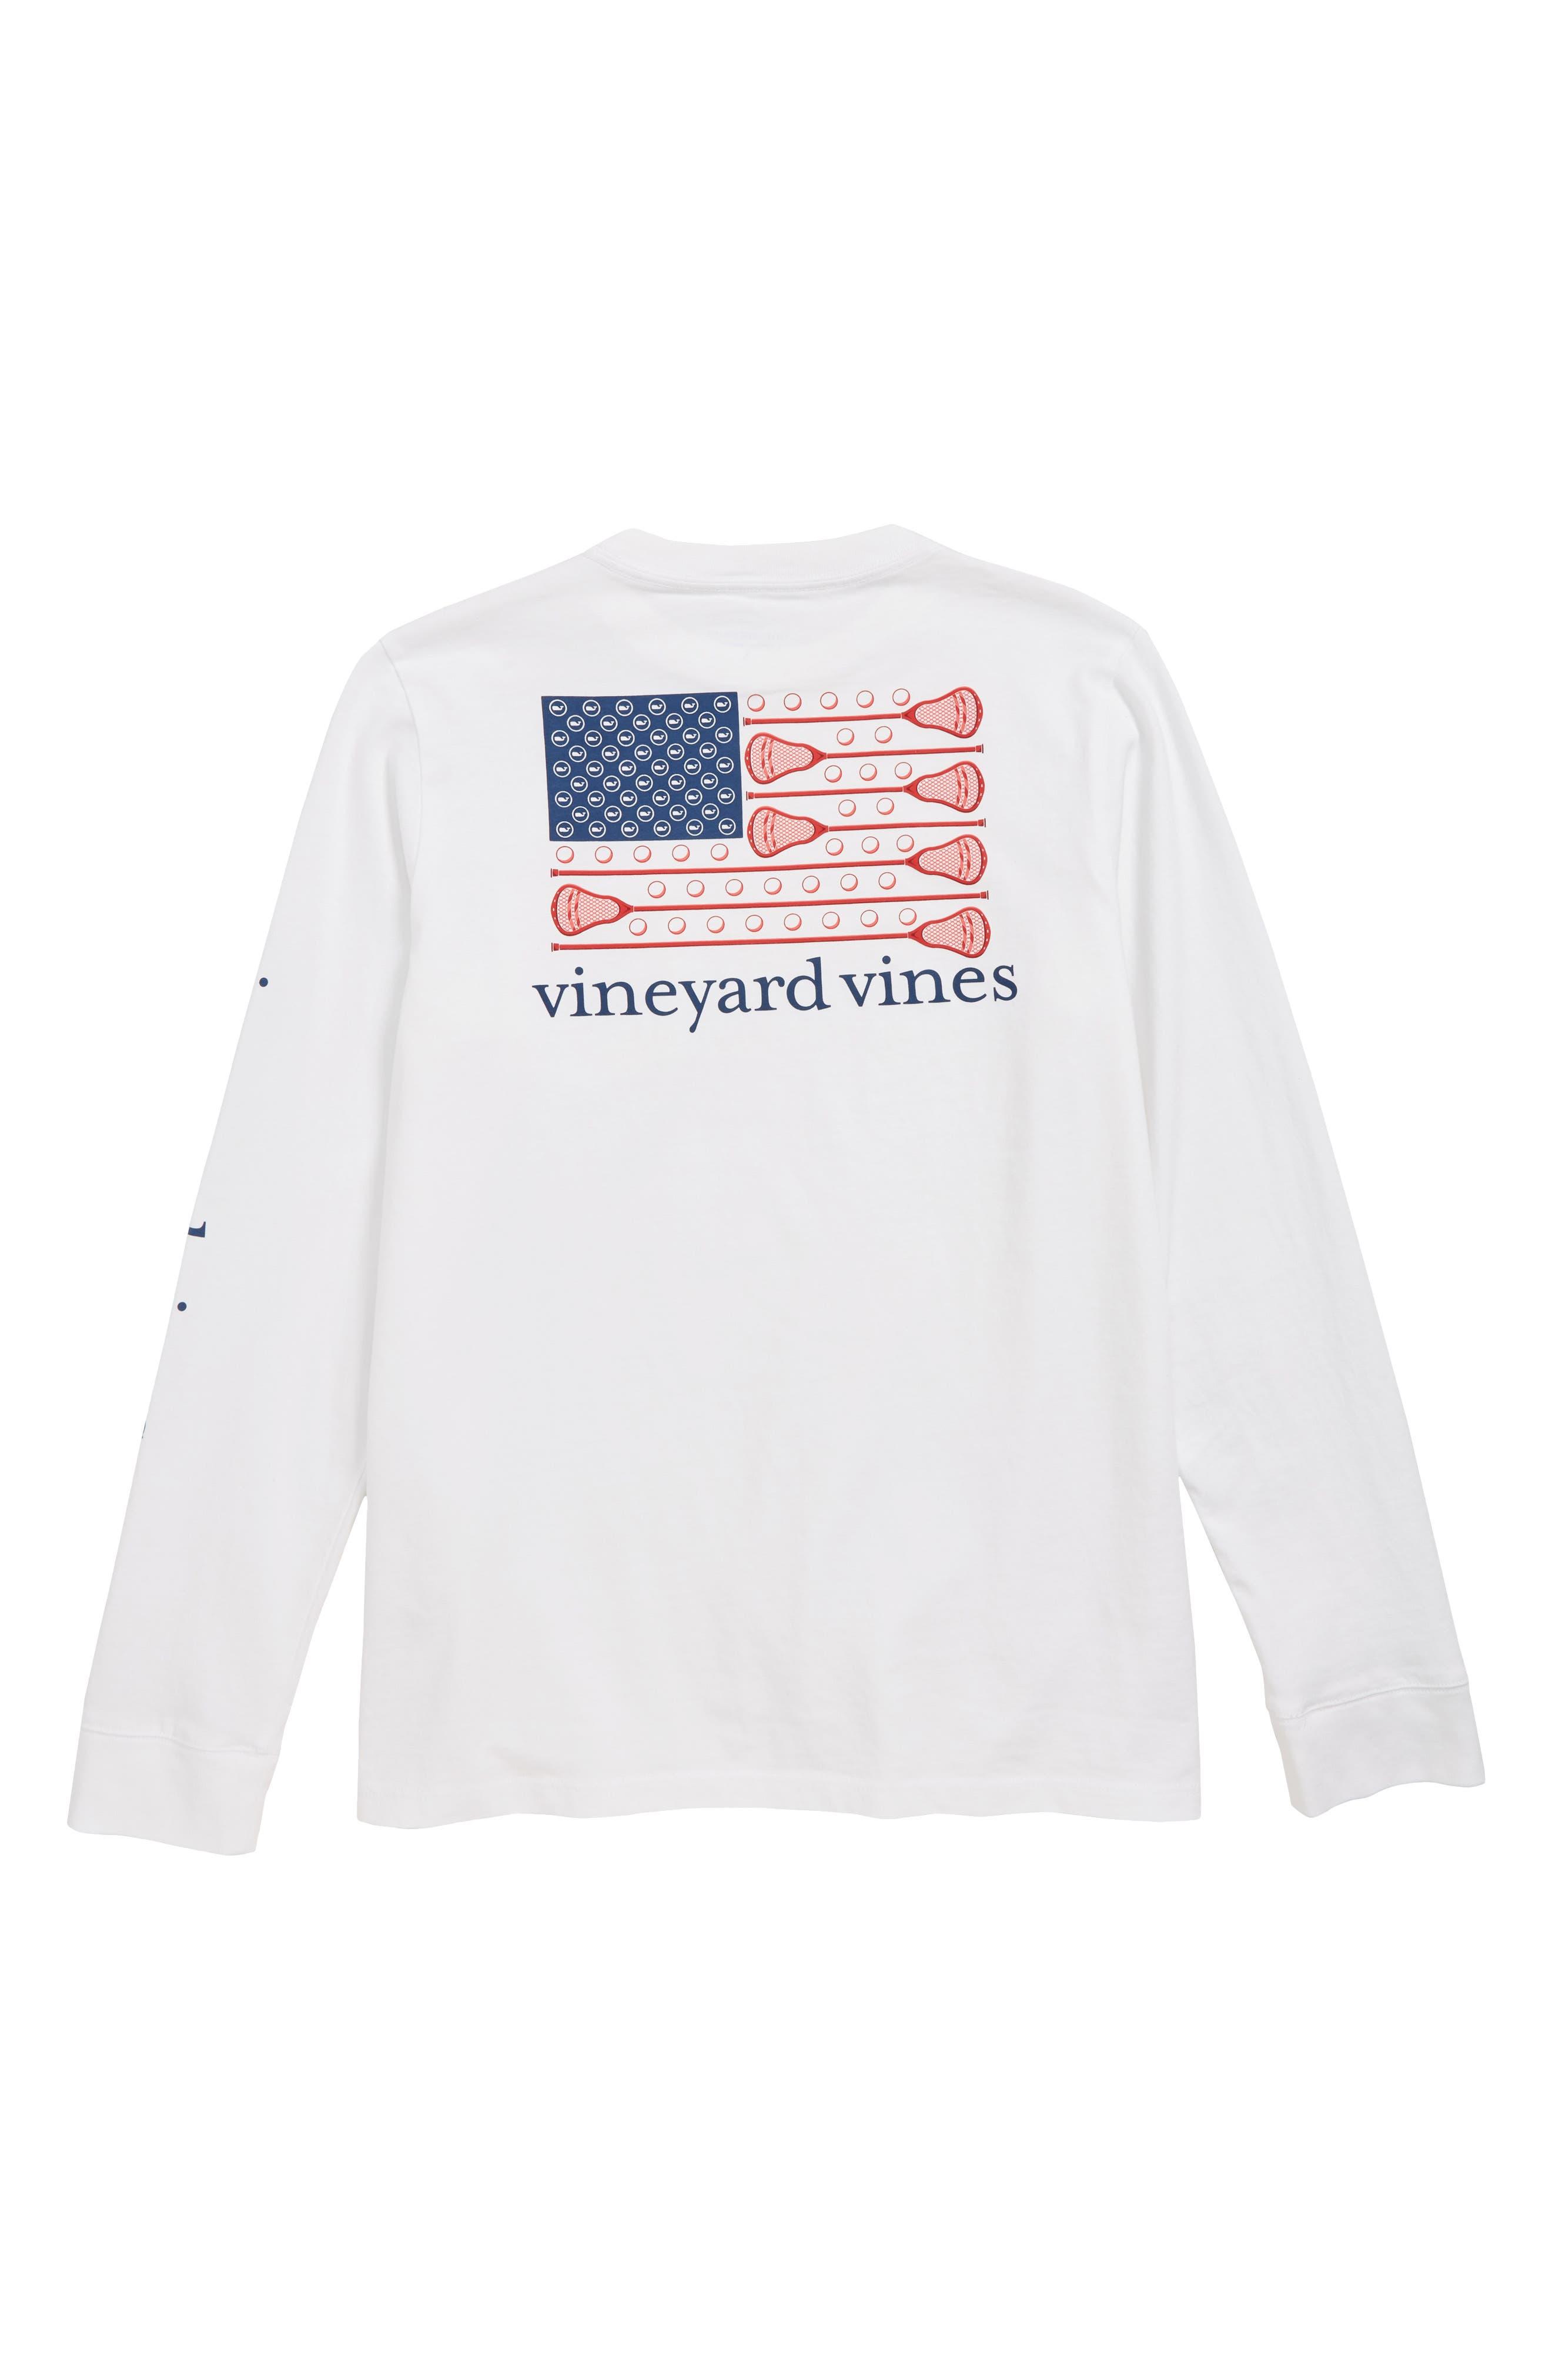 VINEYARD VINES, Lacrosse Flag Pocket T-Shirt, Alternate thumbnail 2, color, 100